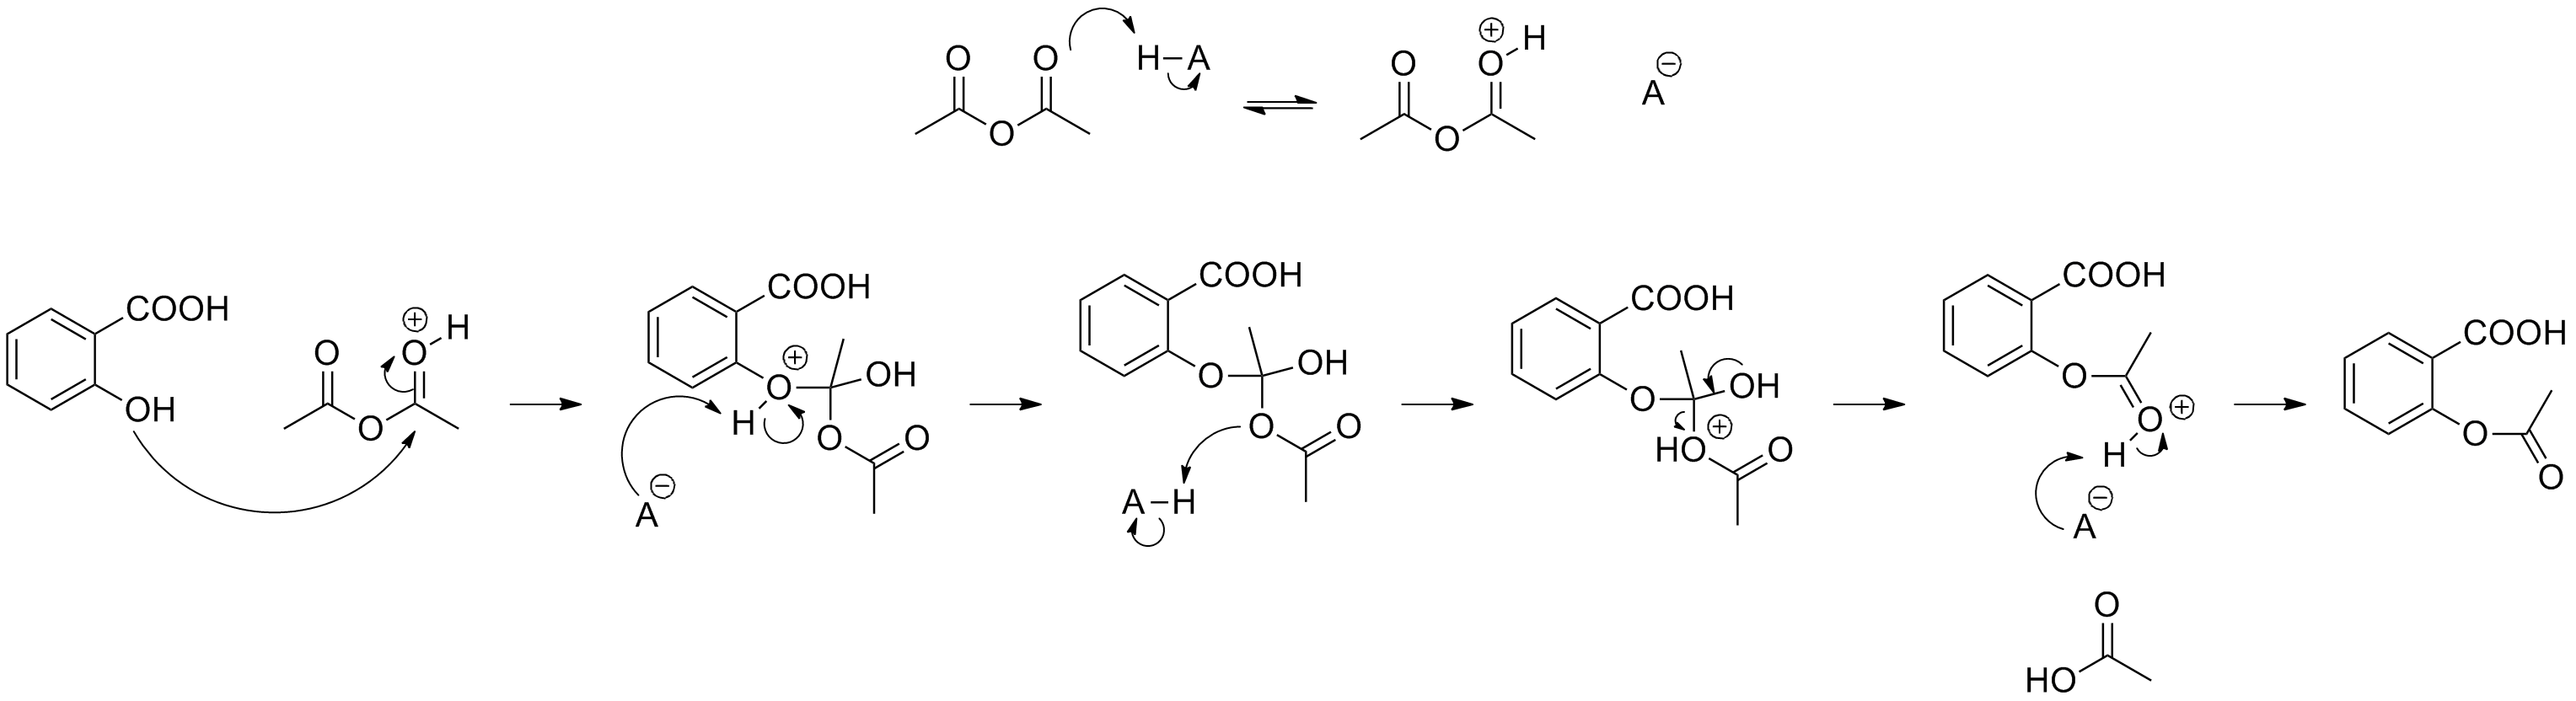 an analysis of a laboratory esterification experiment on salicylic acid Laboratory 24: properties of carboxylic acids and esters  laboratory 24: properties of carboxylic acids and esters  methanol + salicylic acid.